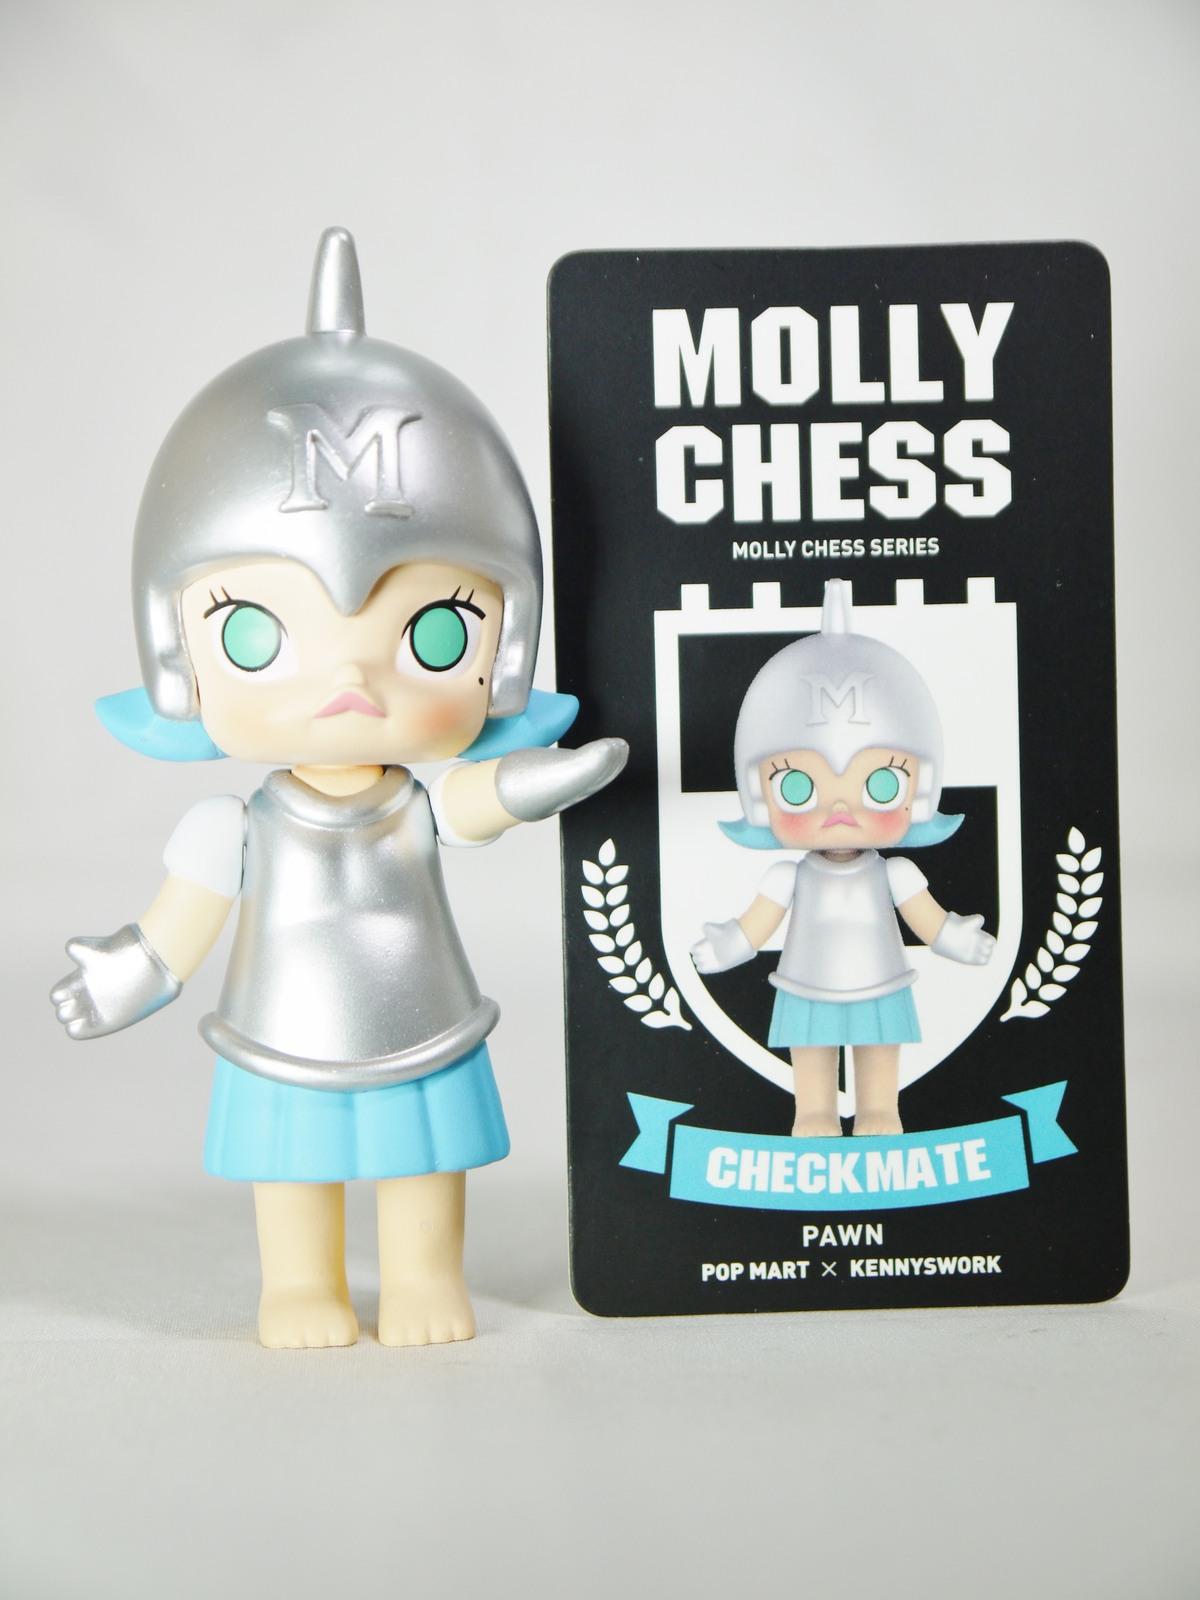 POP MART Kennyswork BLOCK Little Molly Chess Club Chessmate PAWN Silver & Blue